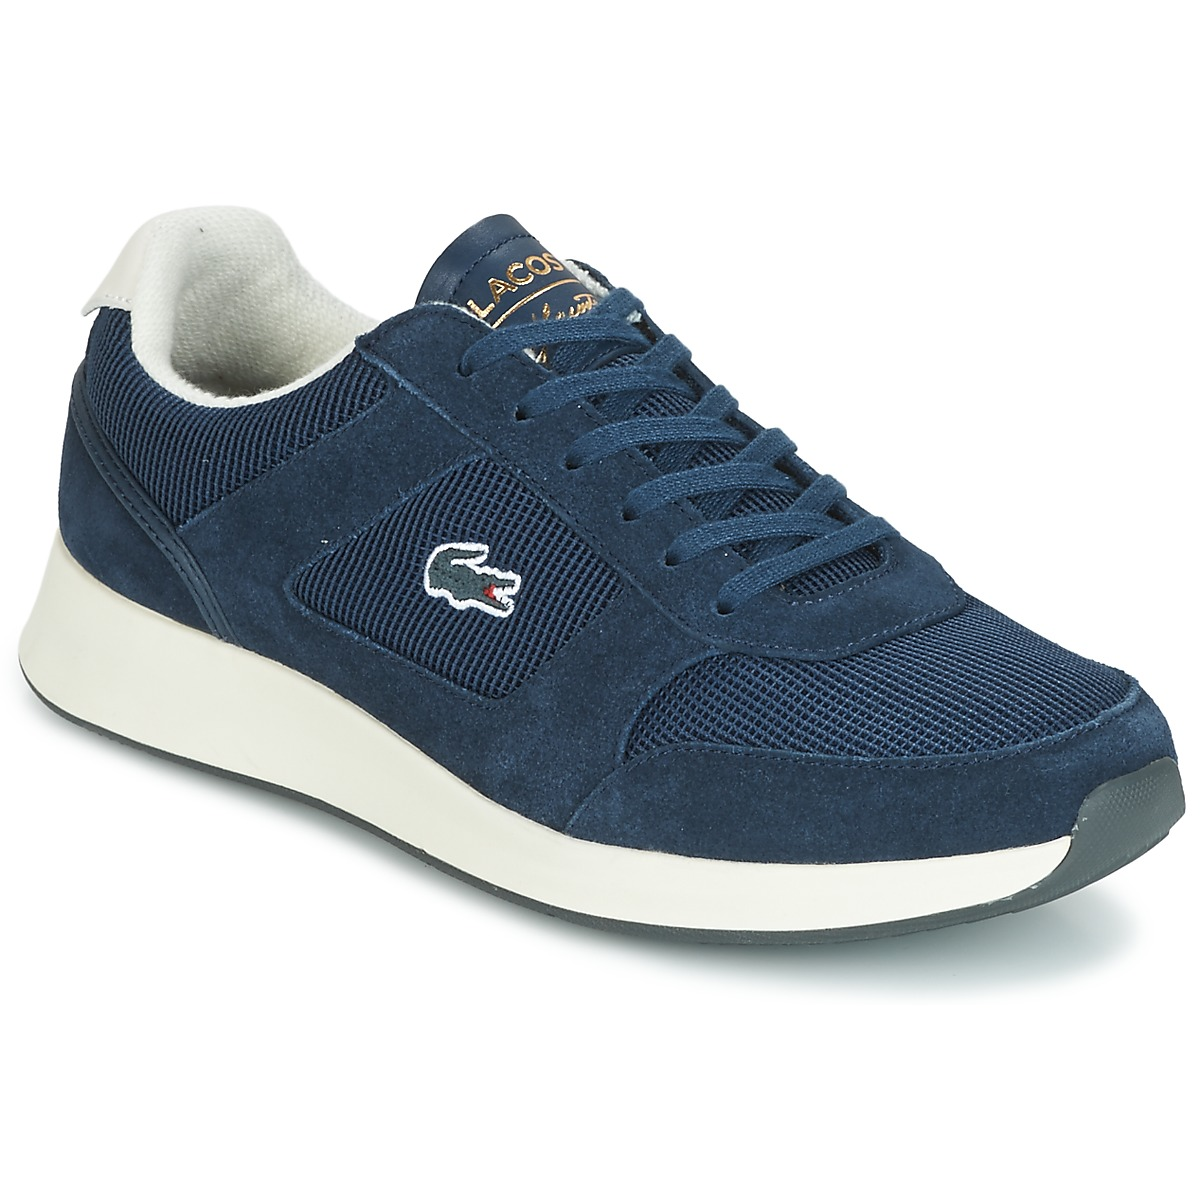 Lacoste JOGGEUR 118 1 Blau - Kostenloser Versand bei Spartoode ! - Schuhe Sneaker Low Herren 95,20 €